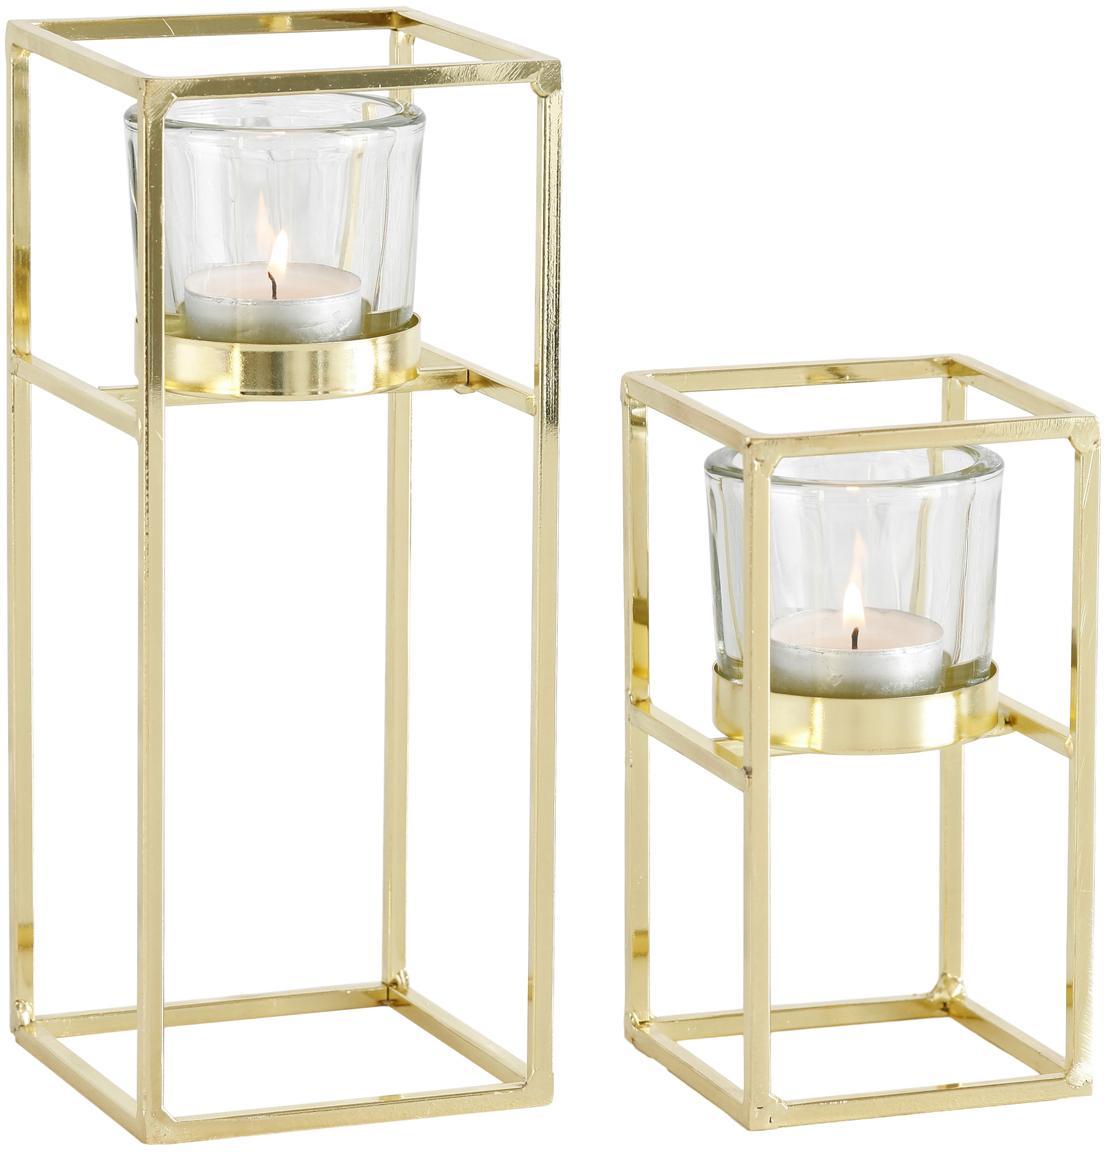 Set 2 portalumini dorati Tomba, Portacandela: vetro, Struttura: metallo rivestito, Trasparente, ottonato, Set in varie misure